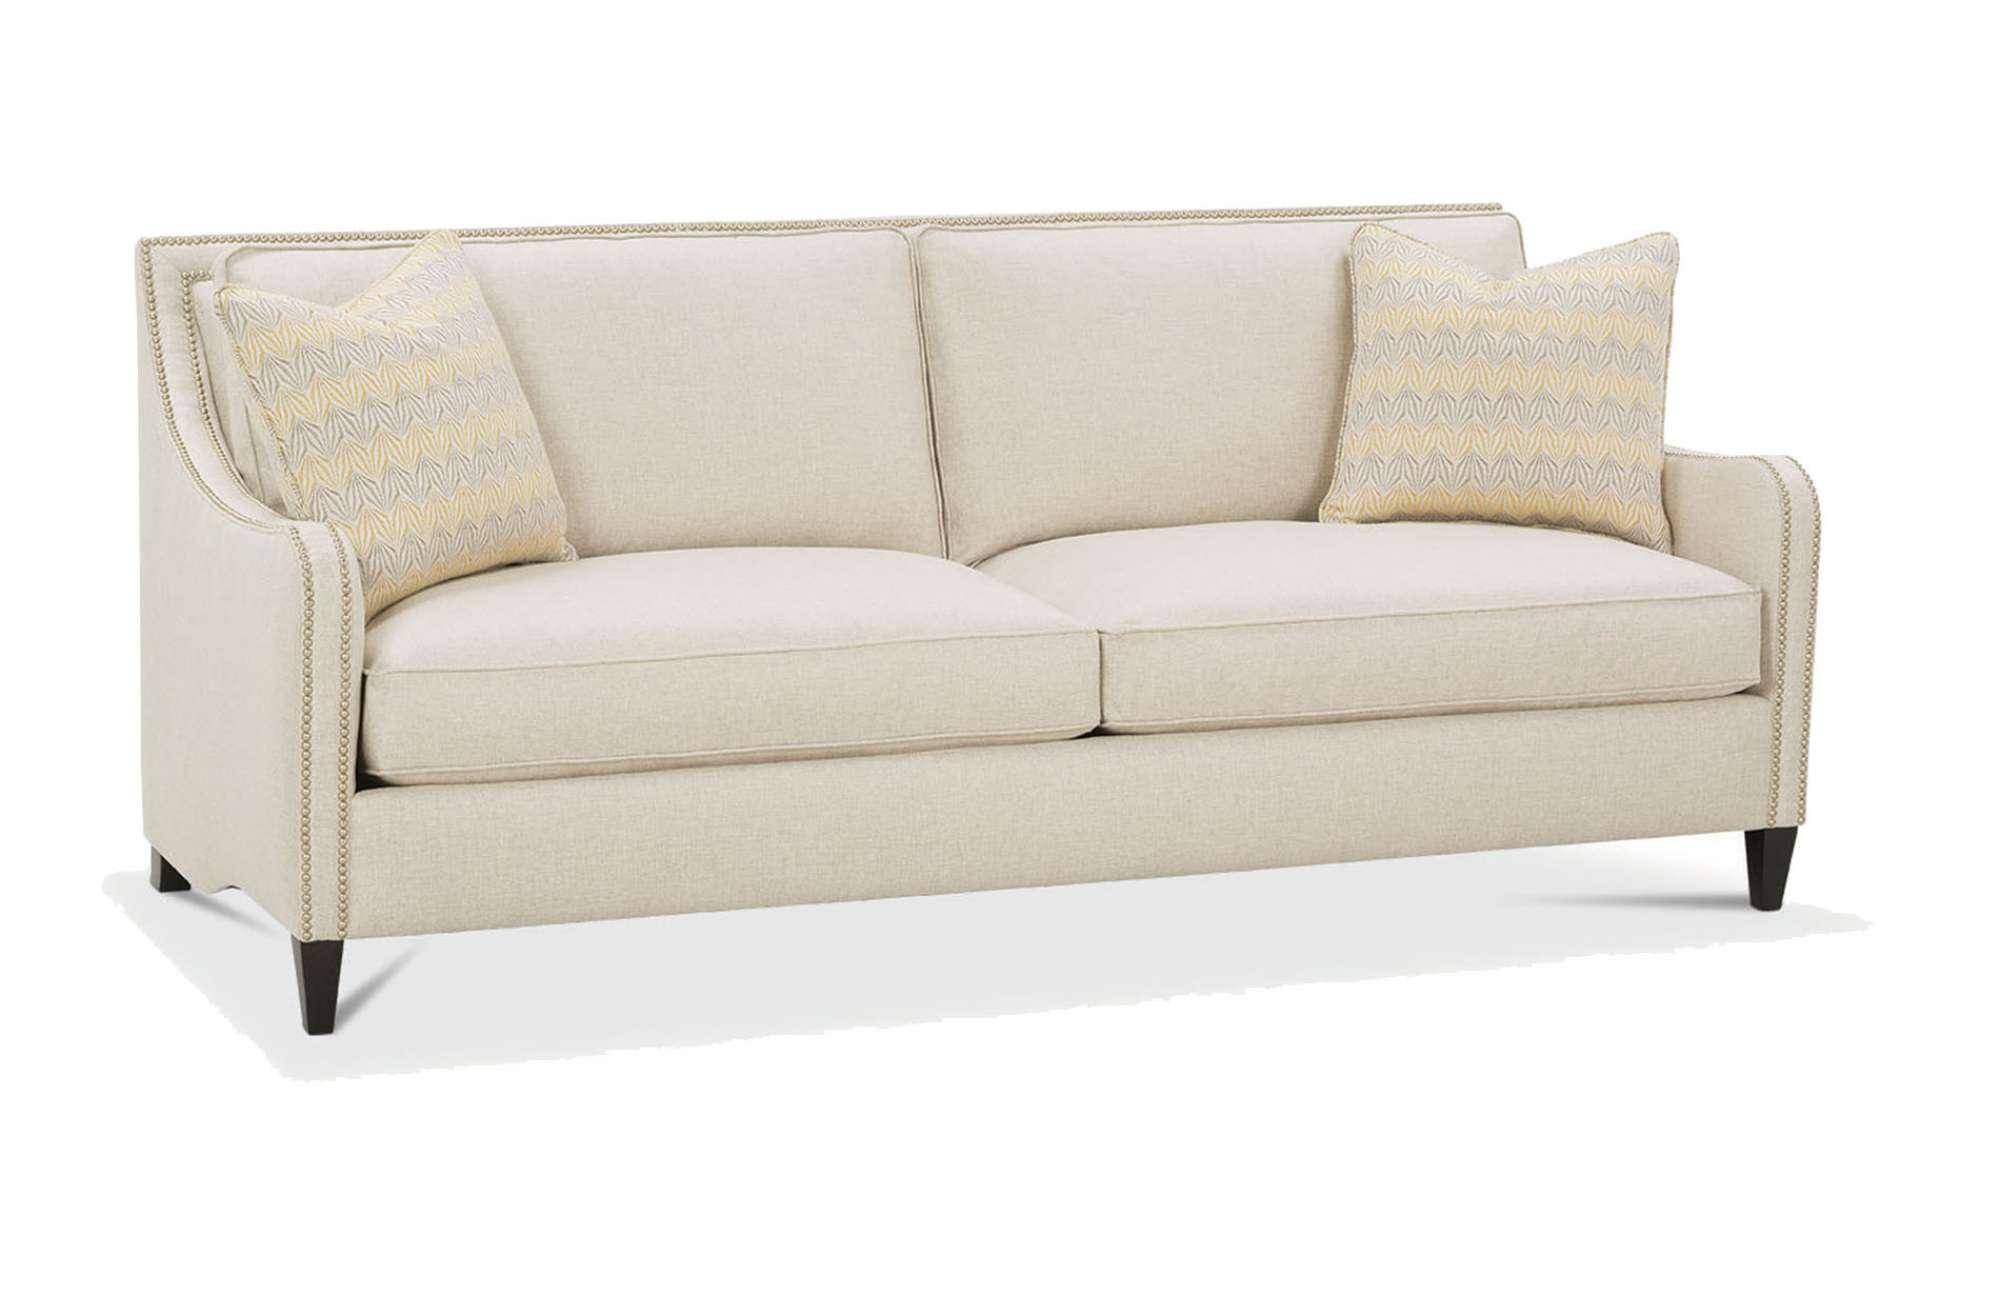 caroline sofa blum 39 s furniture co. Black Bedroom Furniture Sets. Home Design Ideas